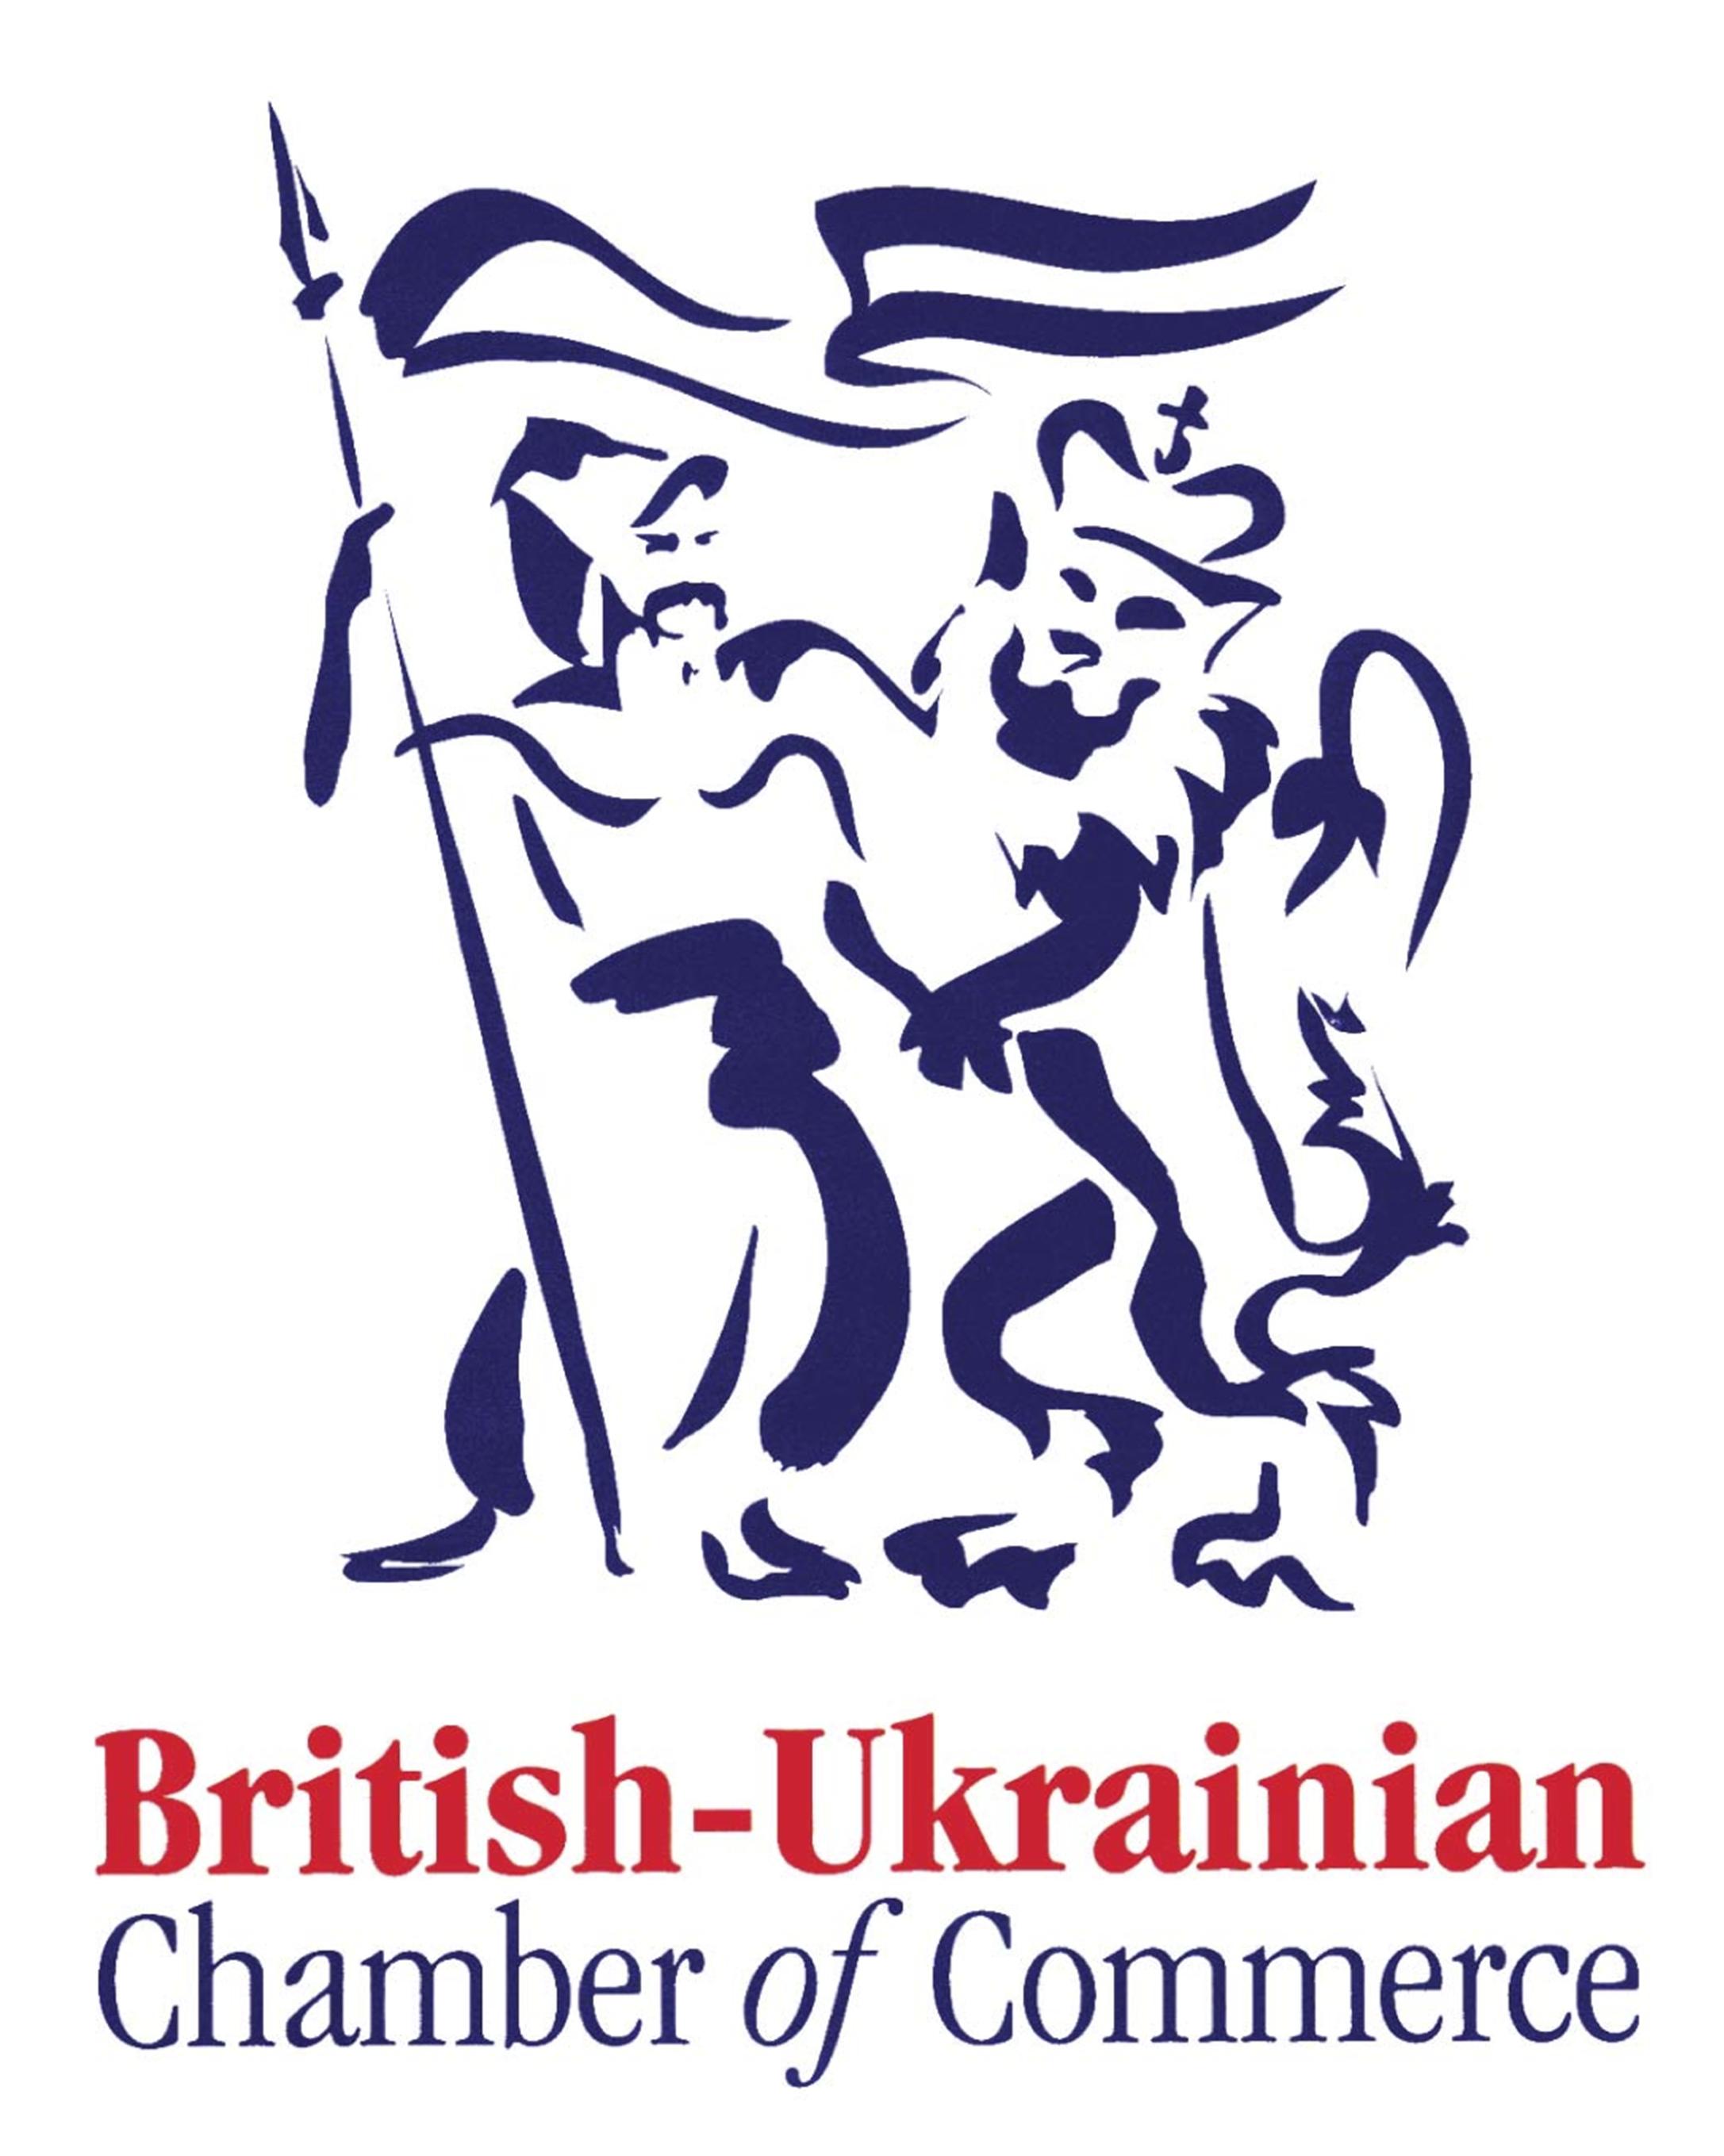 BUCC logo